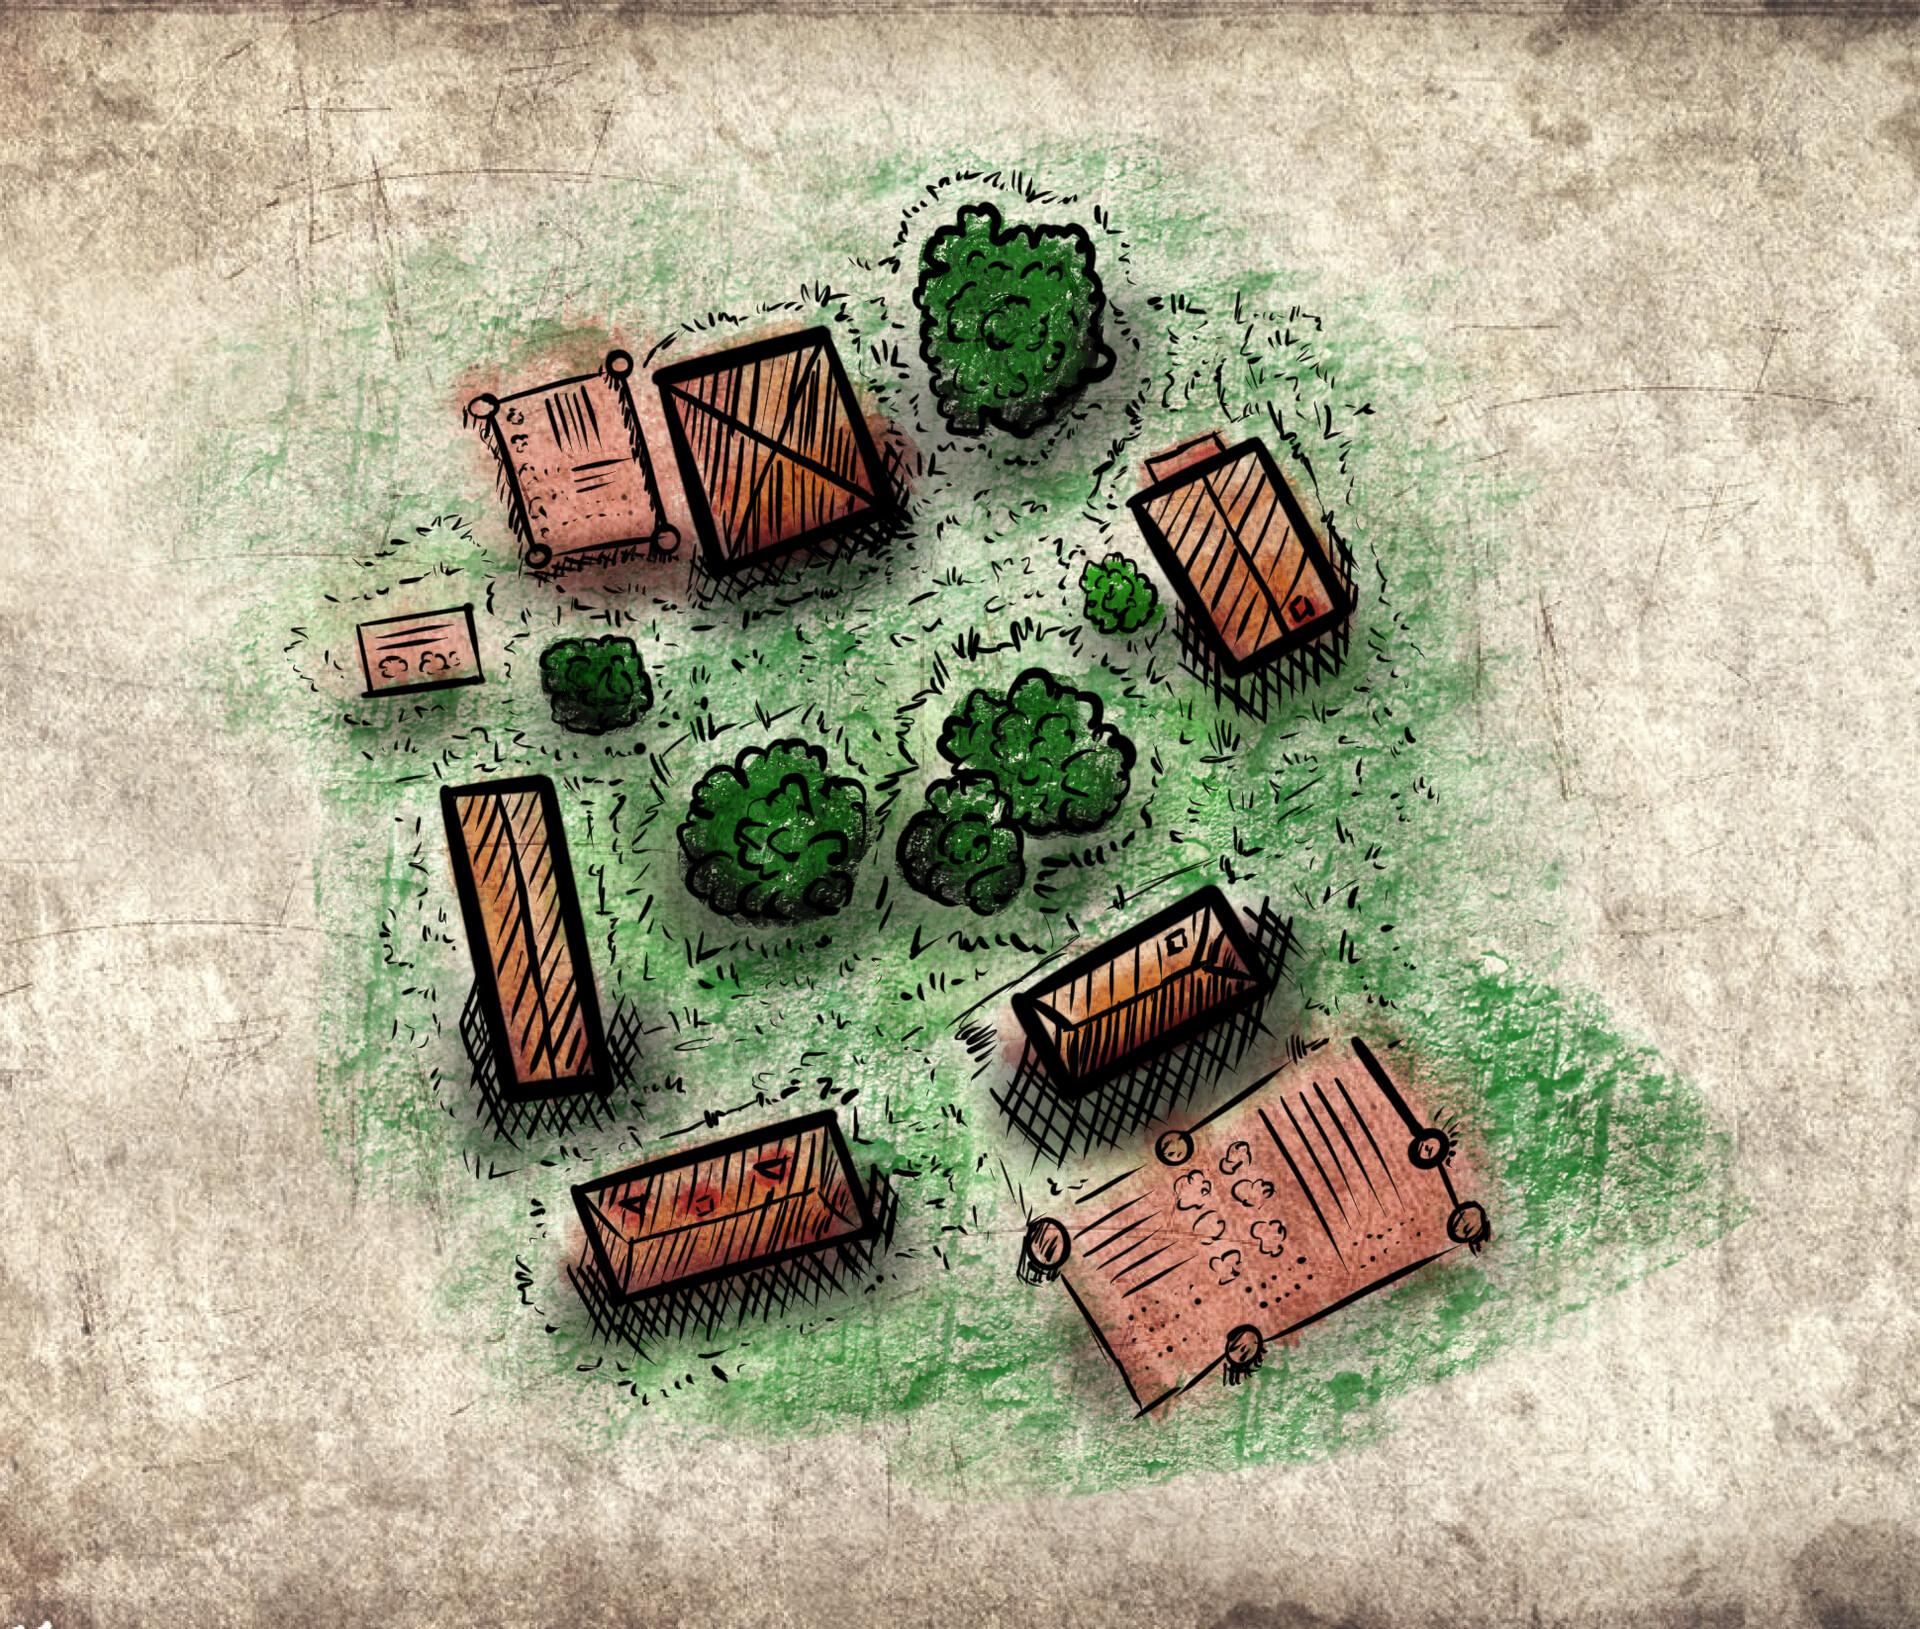 Ronan salieri le hameau